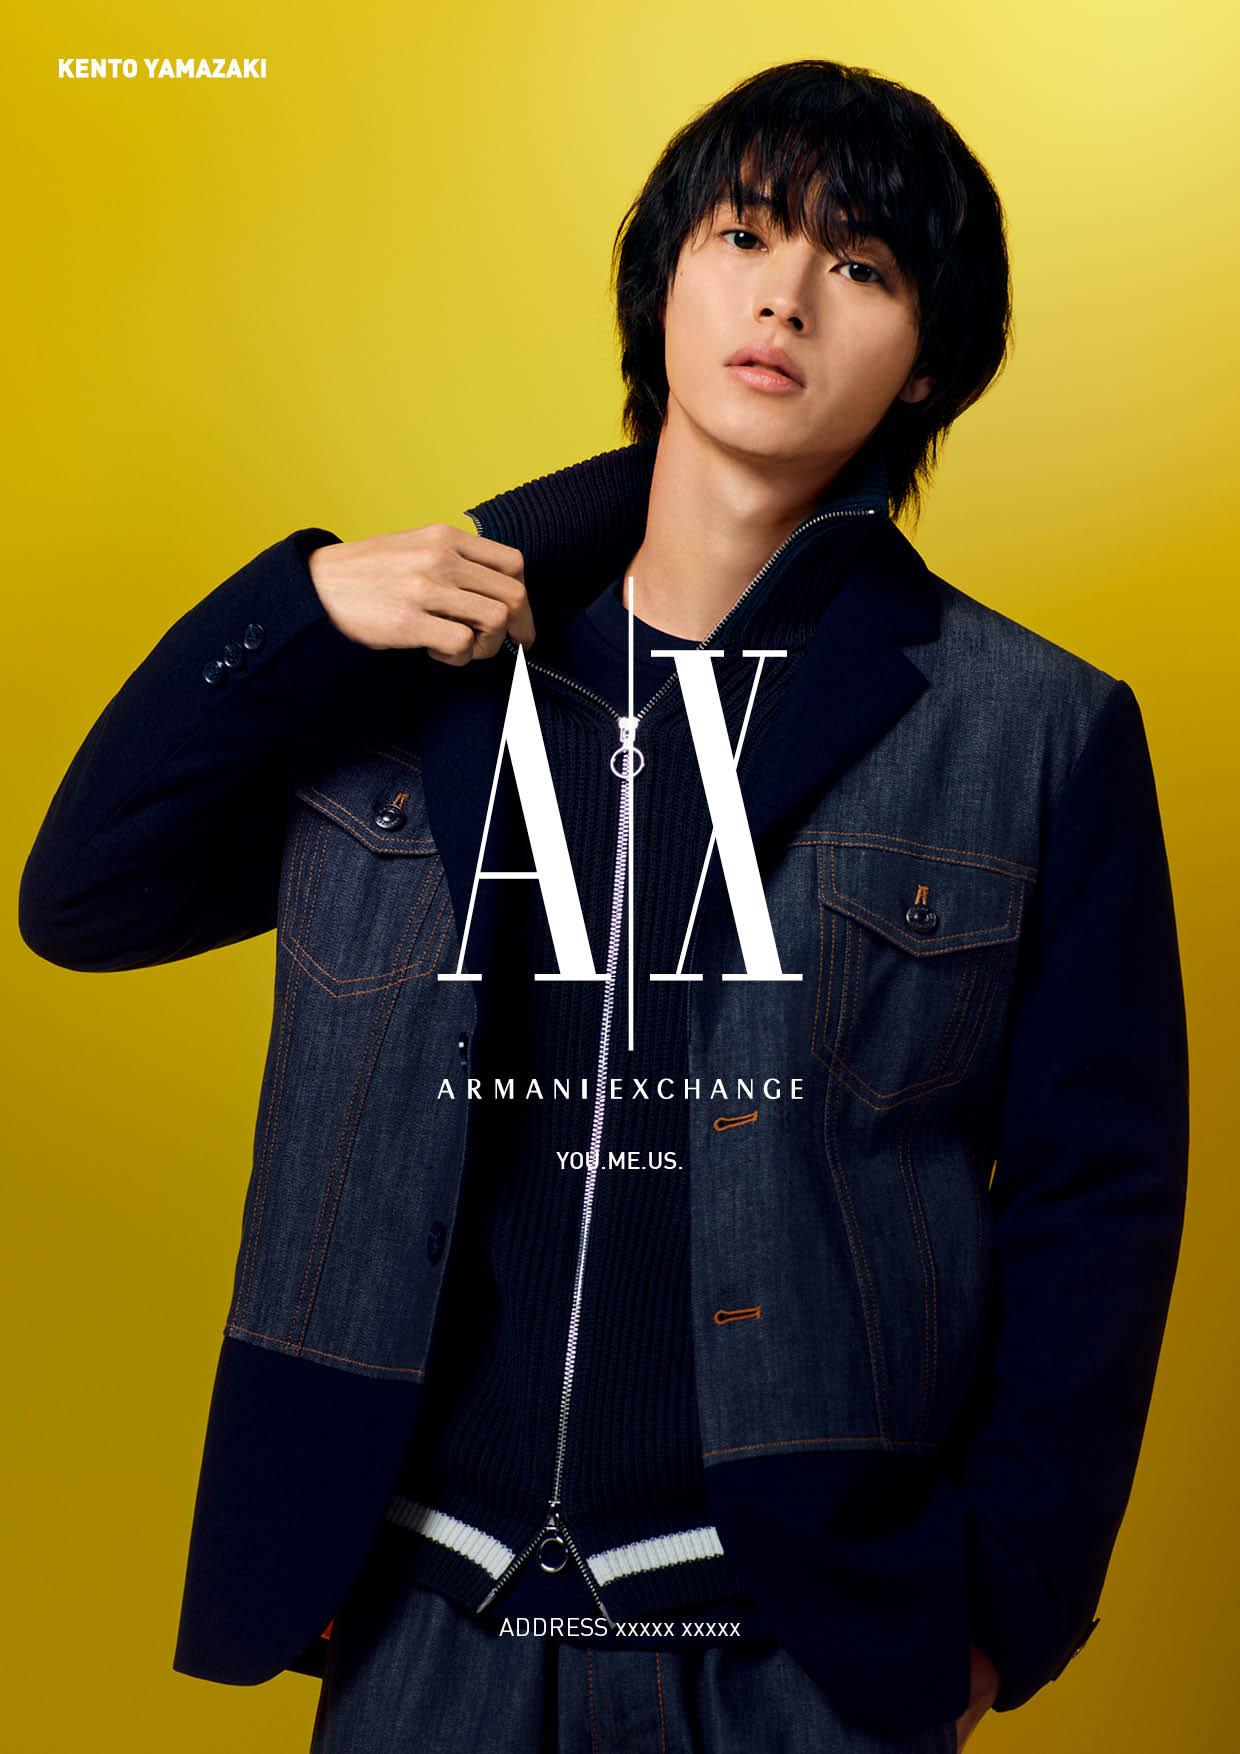 A|X アルマーニエクスチェンジの山崎賢人を起用した秋冬広告